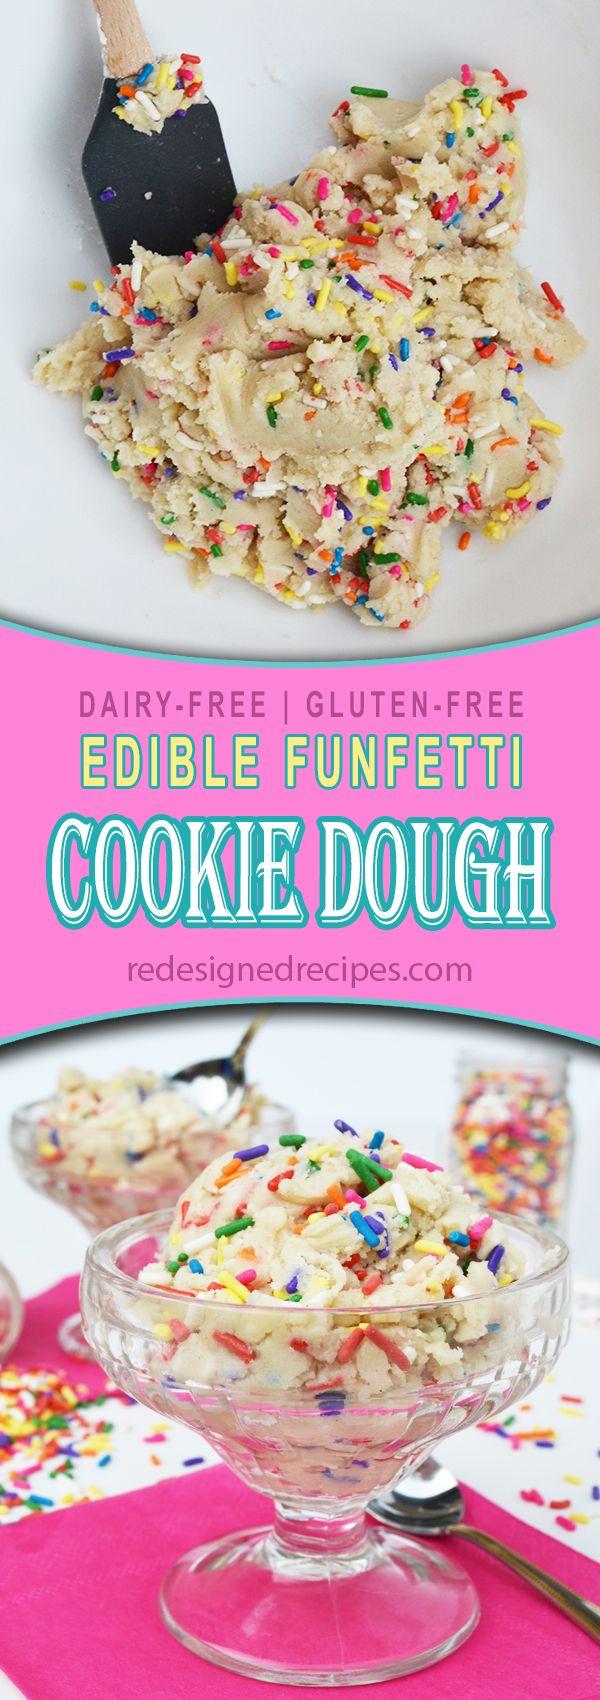 Edible Funfetti Cookie Dough - Redesigned Recipes